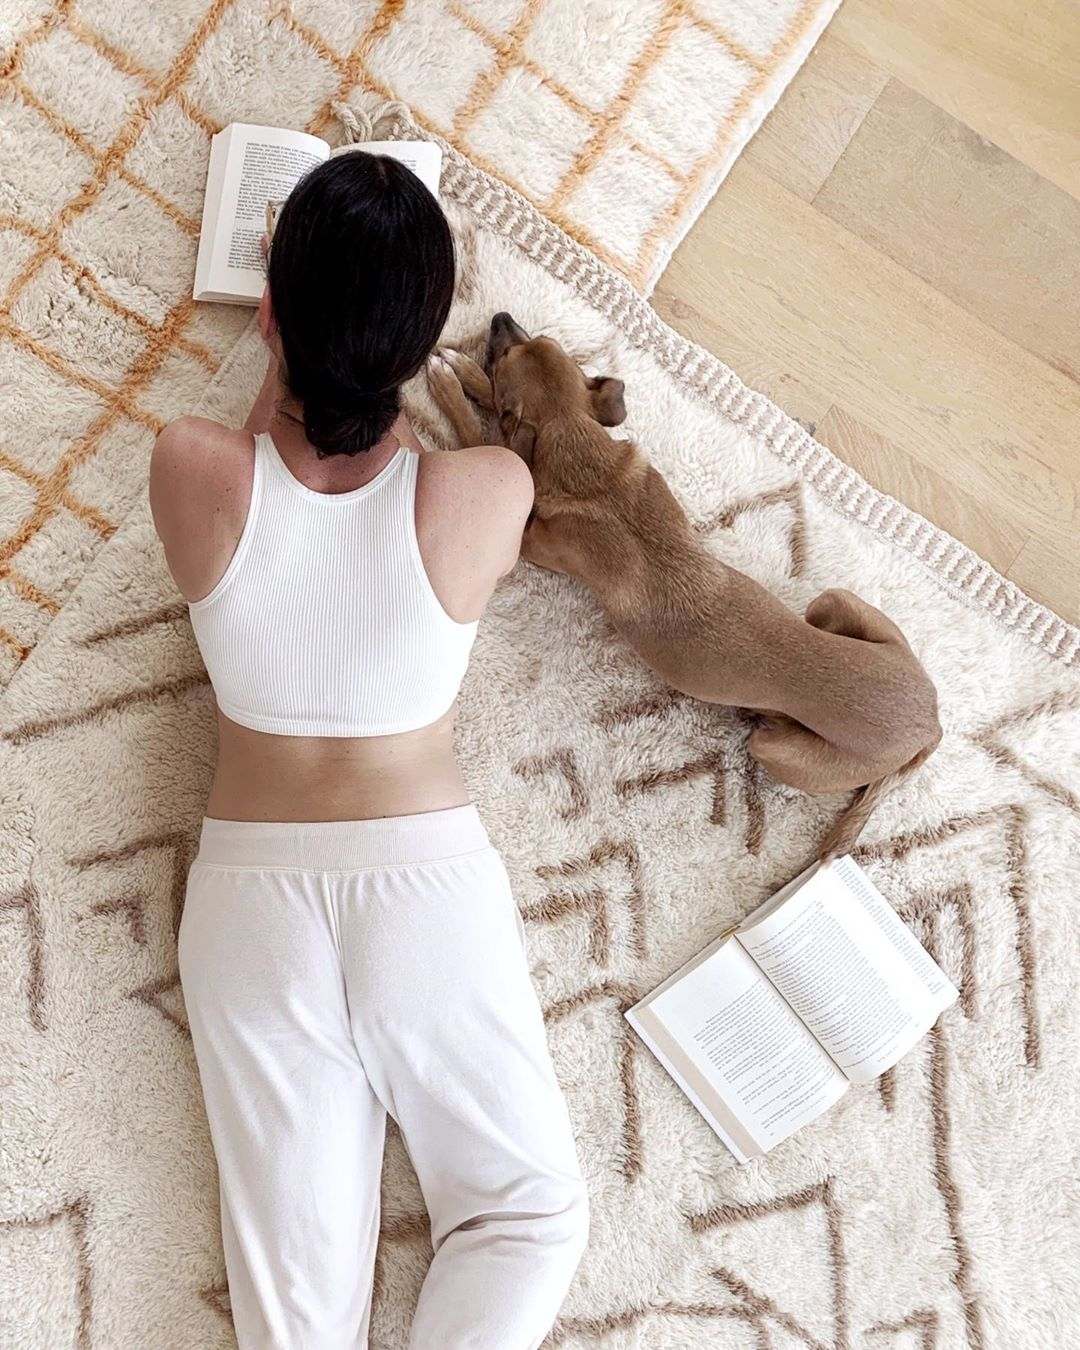 garance dore and her dog